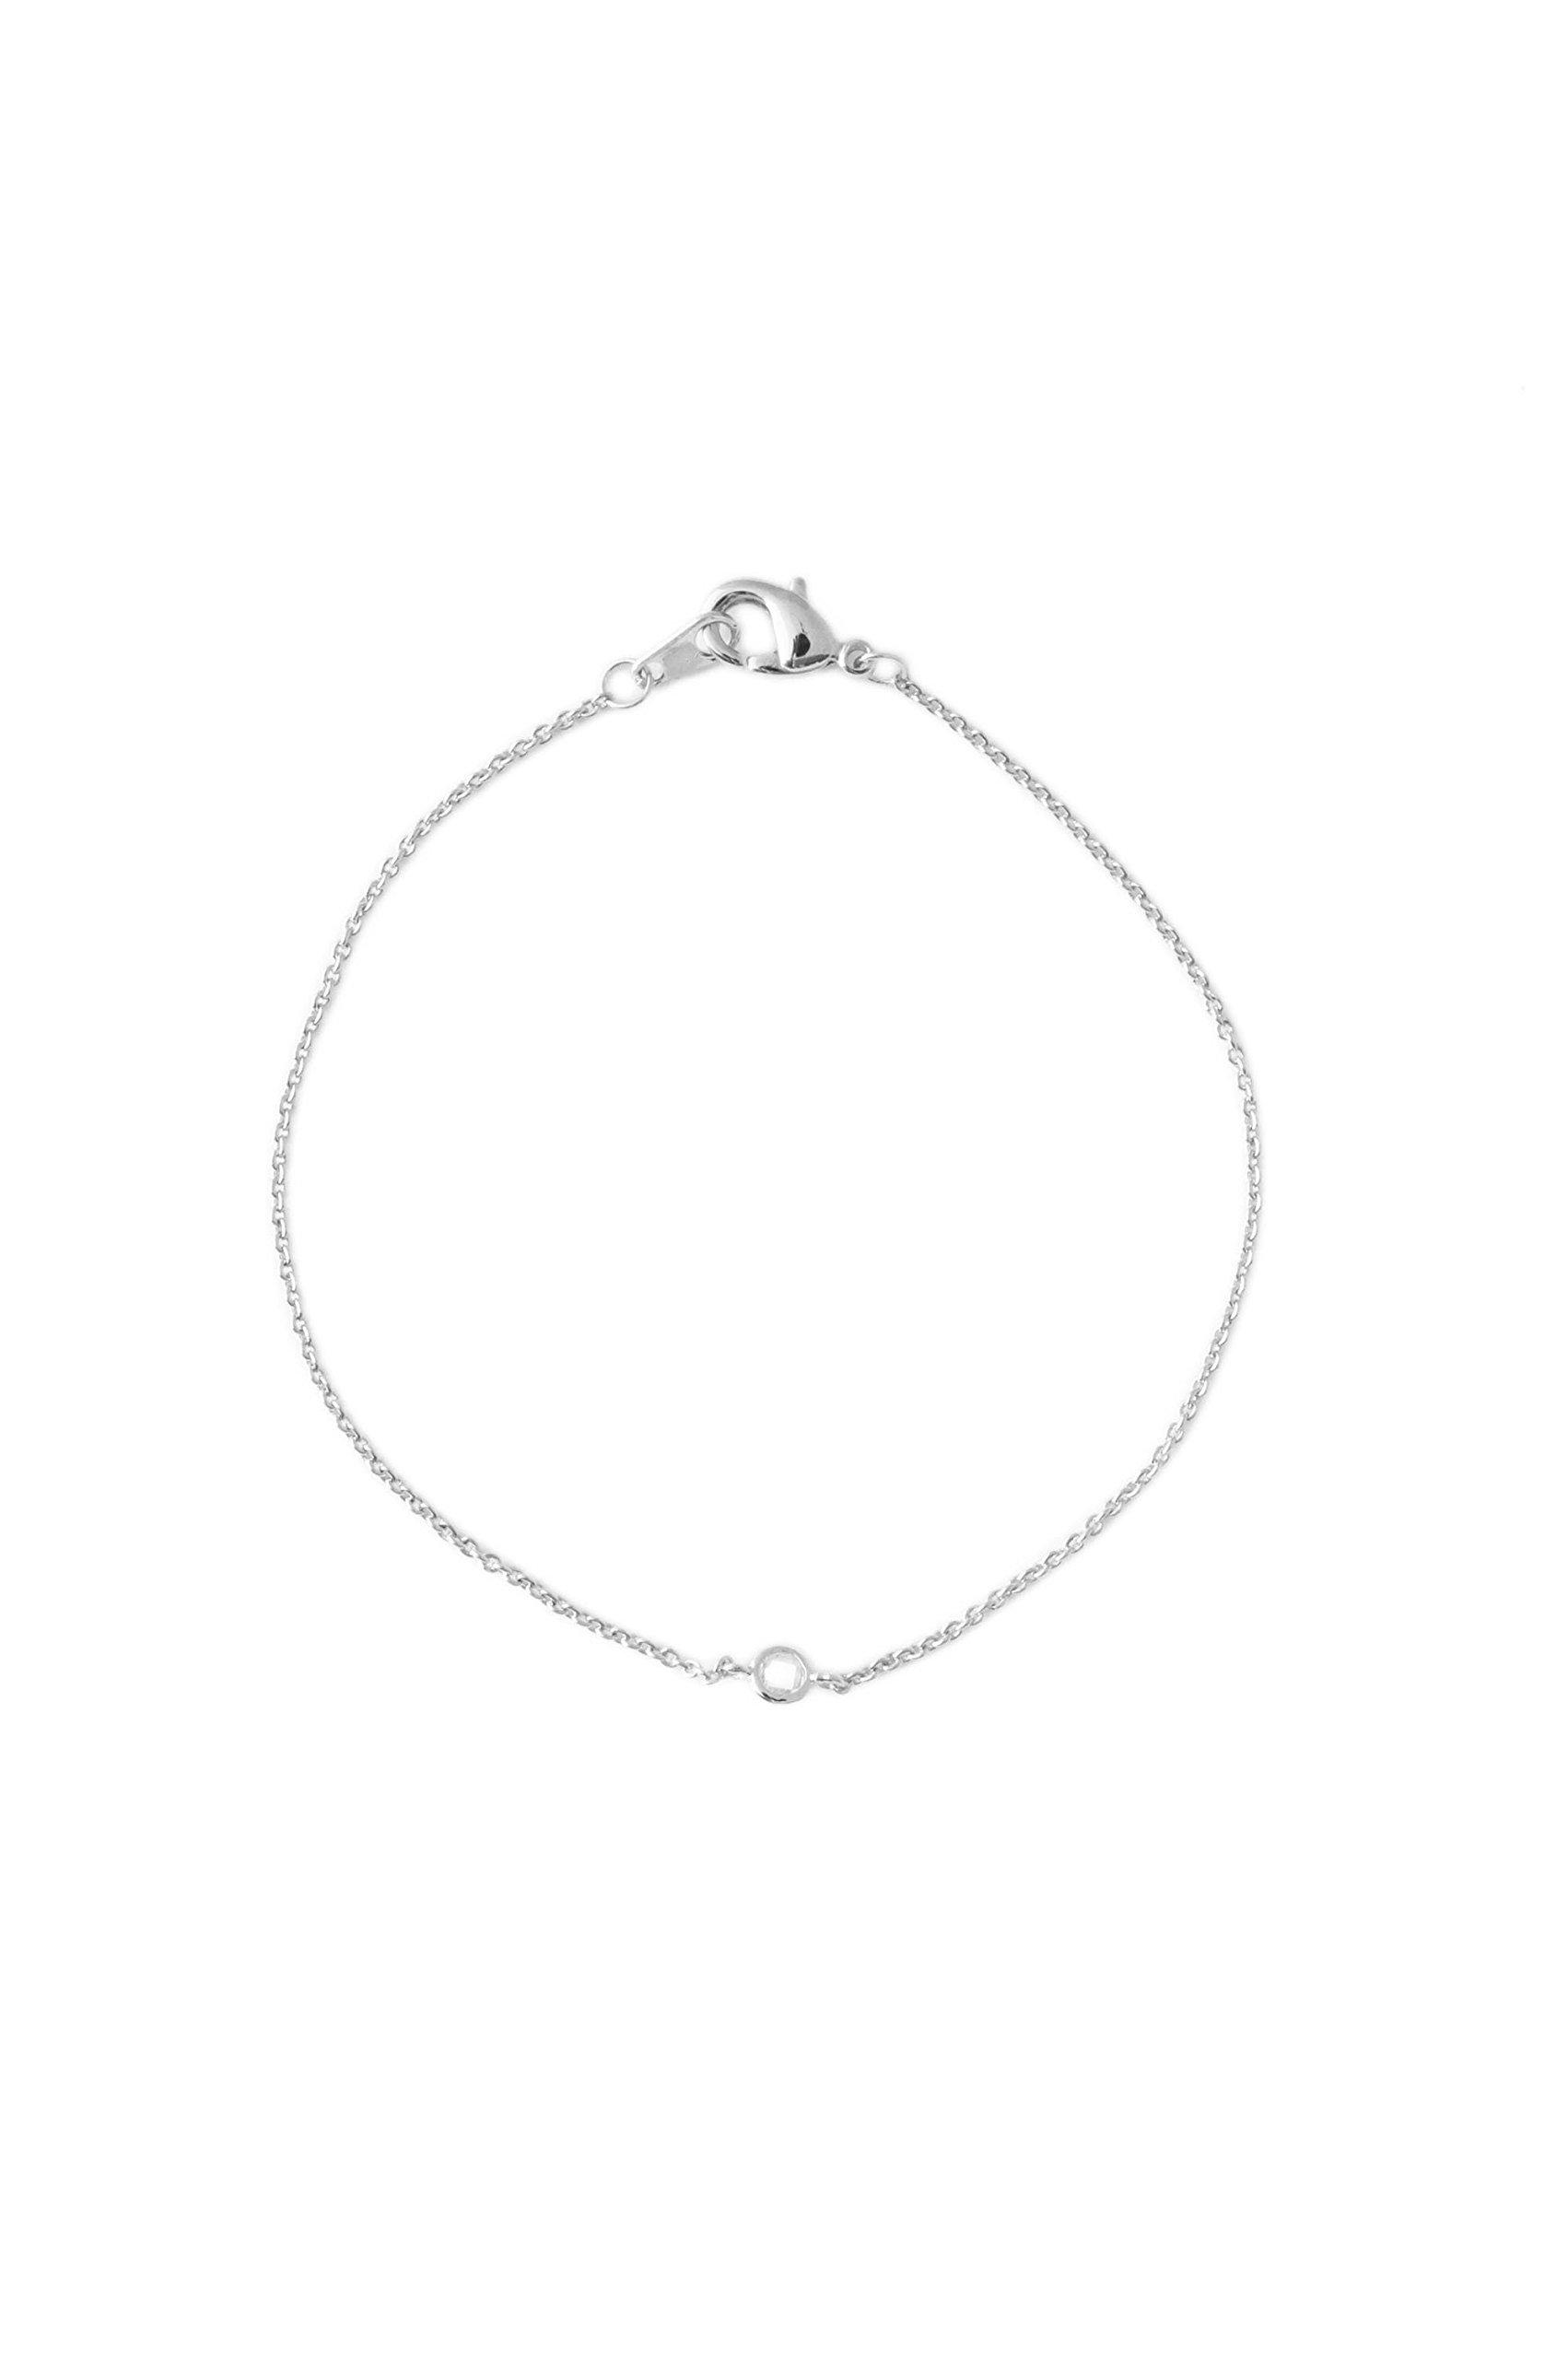 HONEYCAT Single Tiny Crystal Bezel Bracelet in Rhodium Plate   Minimalist, Delicate Jewelry (Silver)